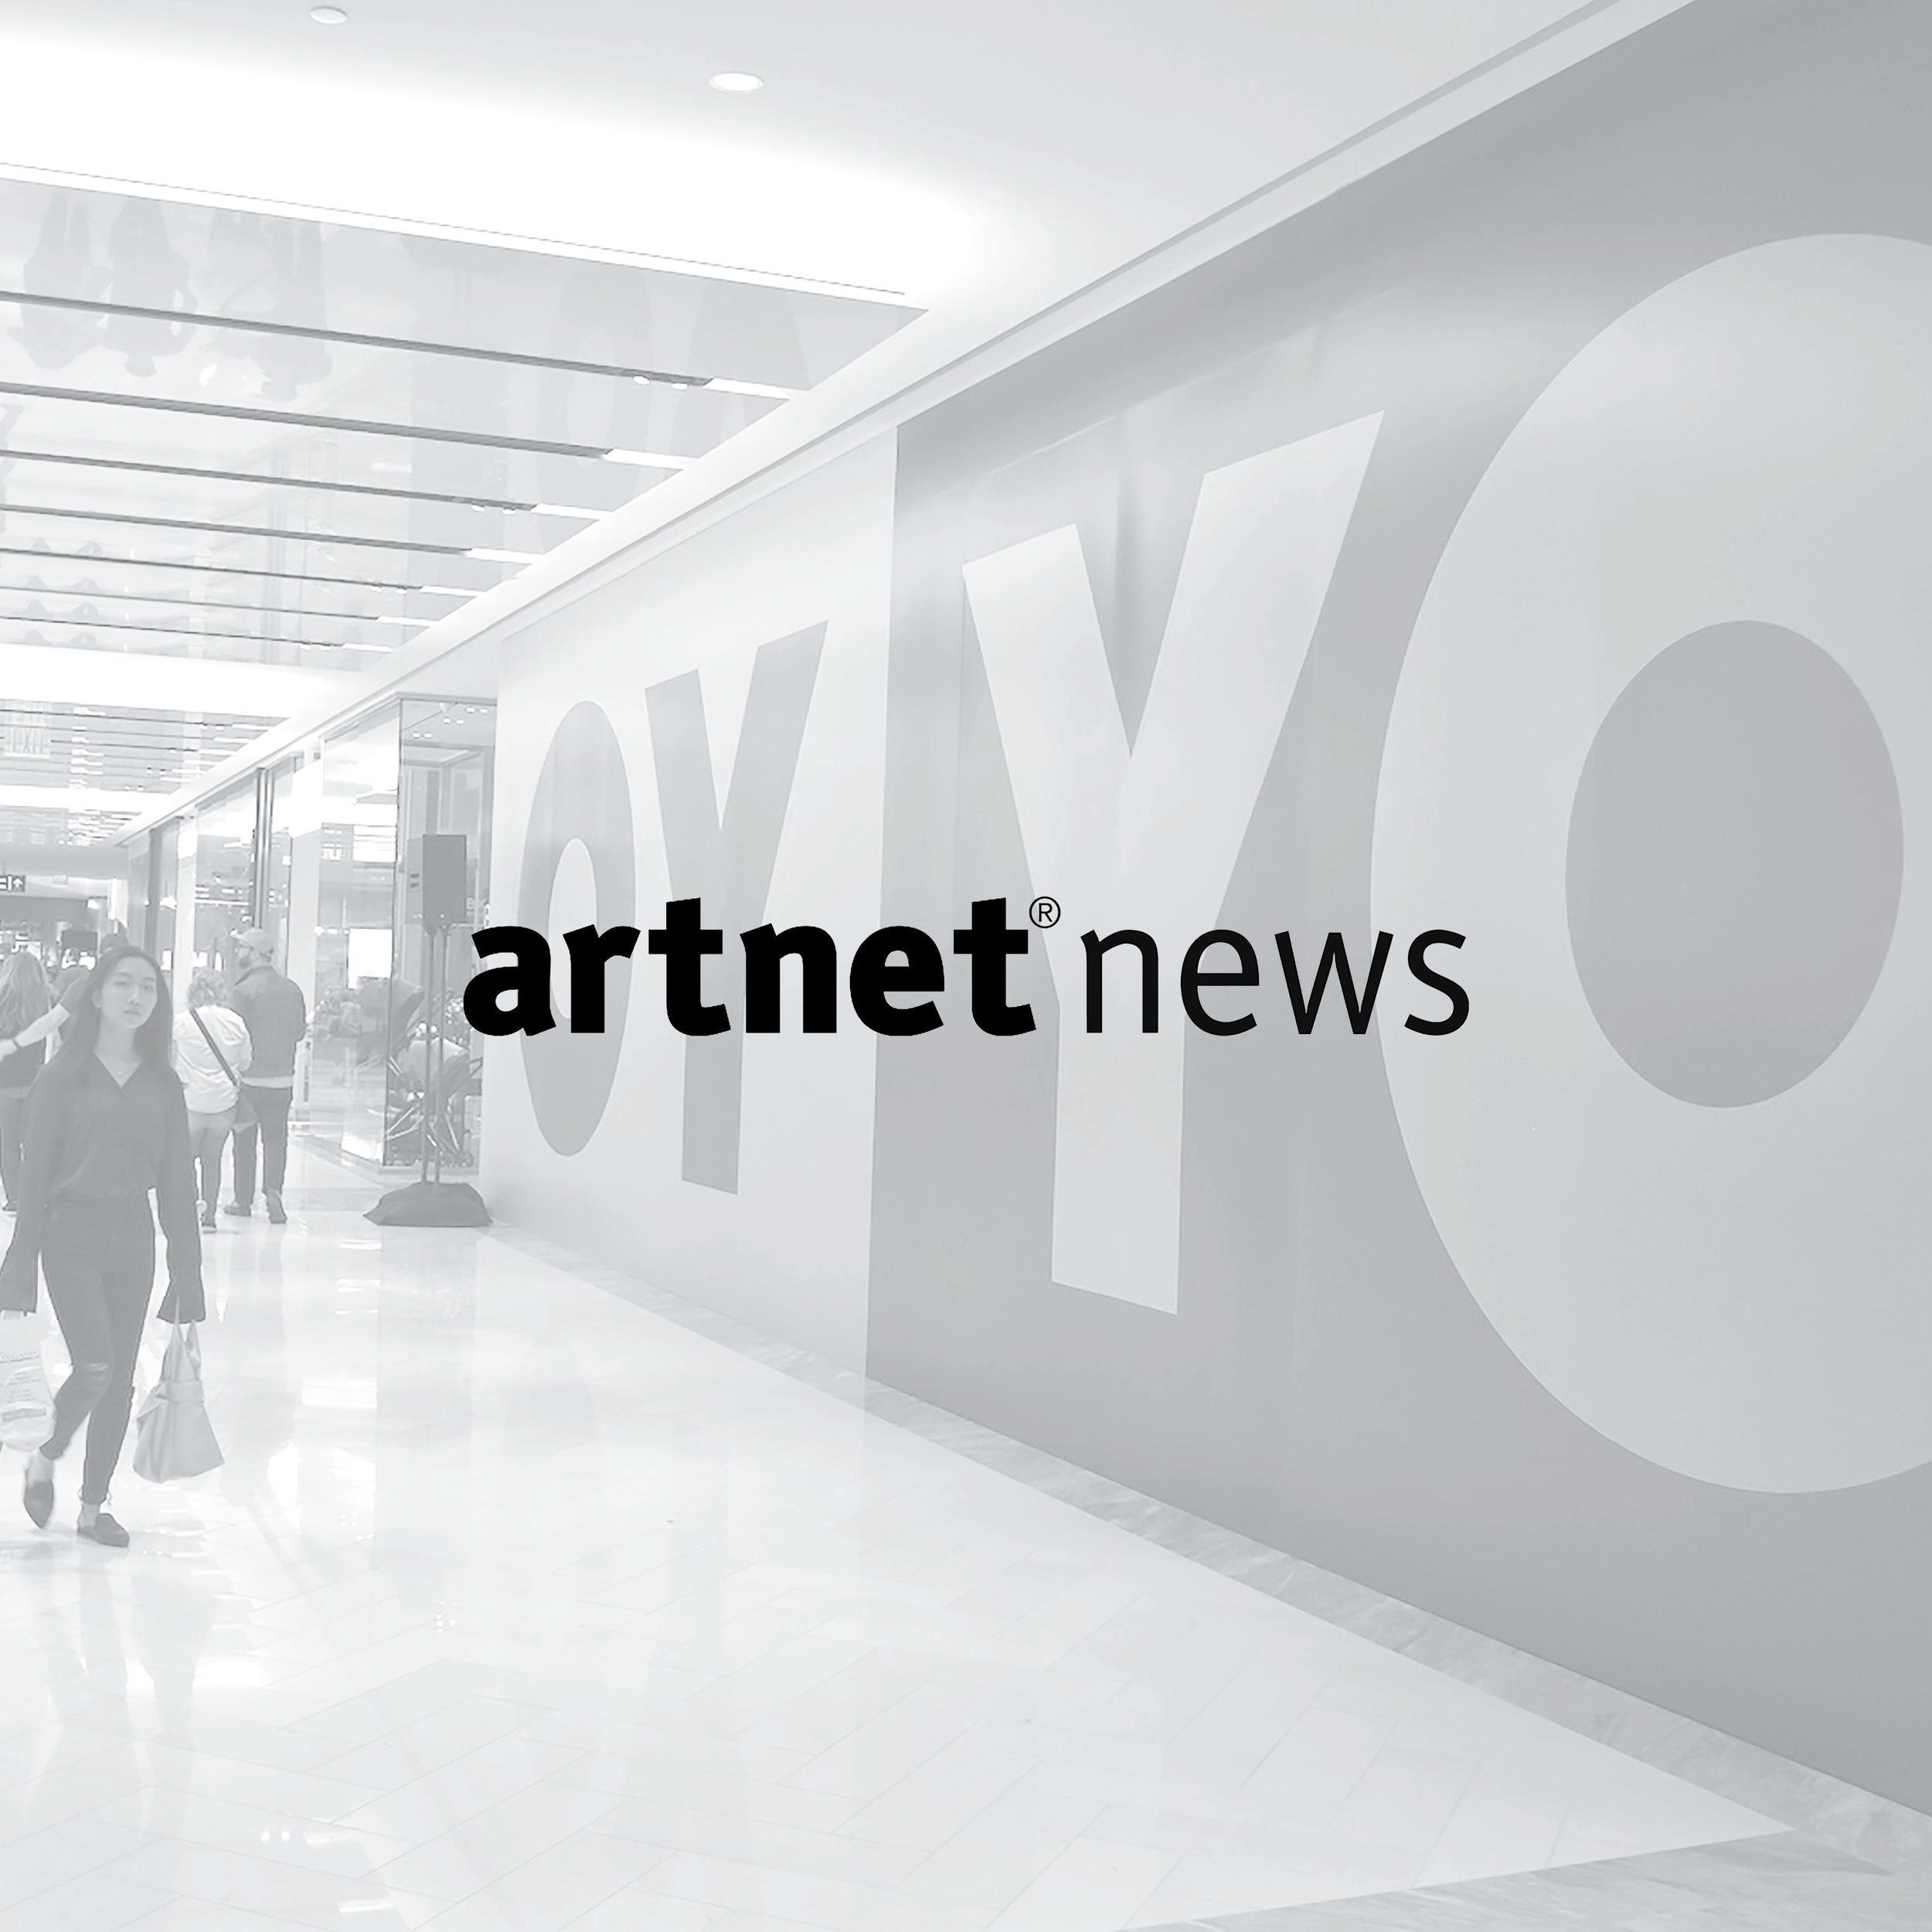 OTW artnet news.jpg